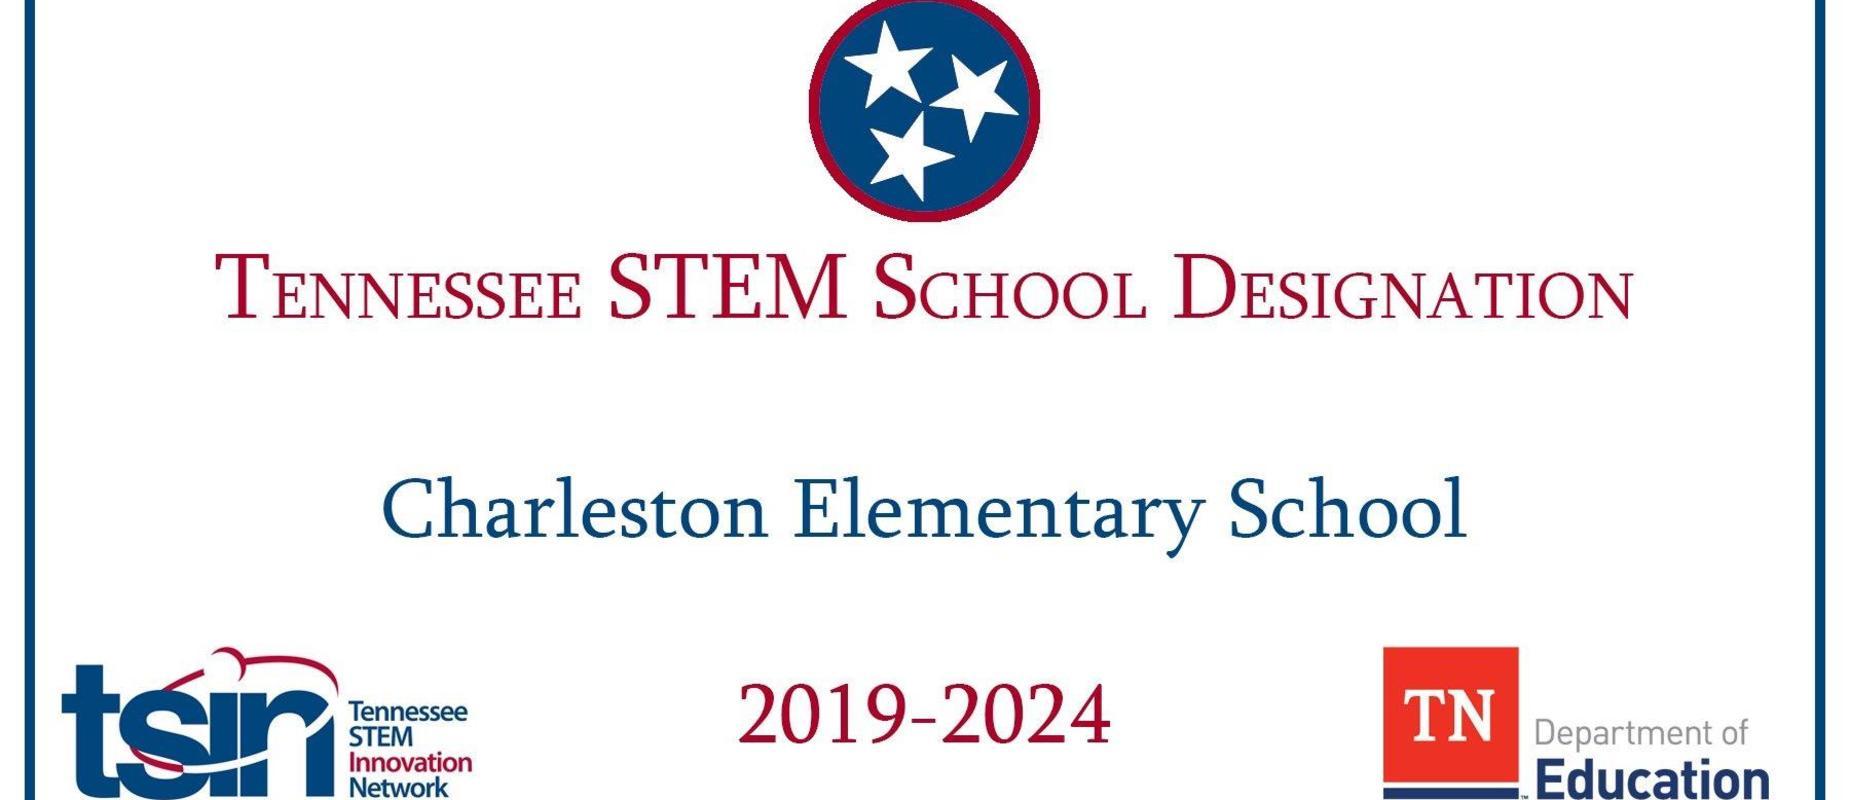 Tennessee STEM school designation 201-2024